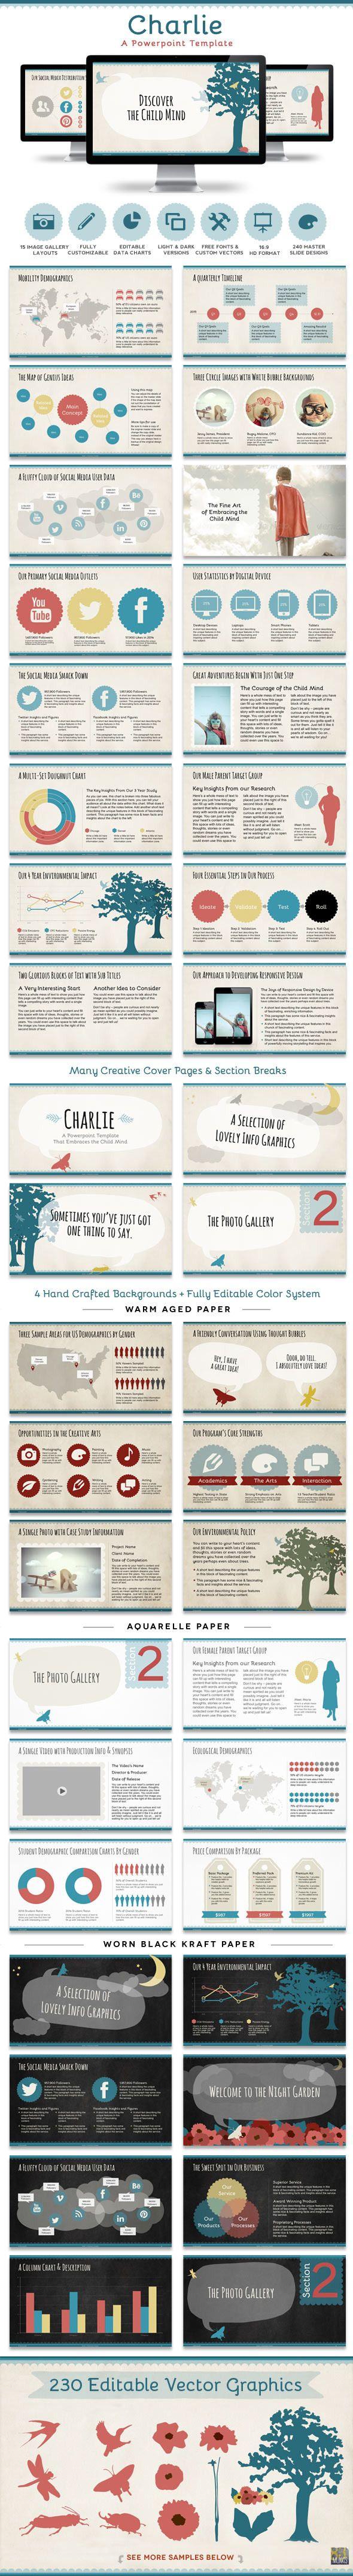 Charlie Powerpoint Presentation Template - A cheerful, flexible design for eBooks, children's marketing, classroom presentations and creative decks